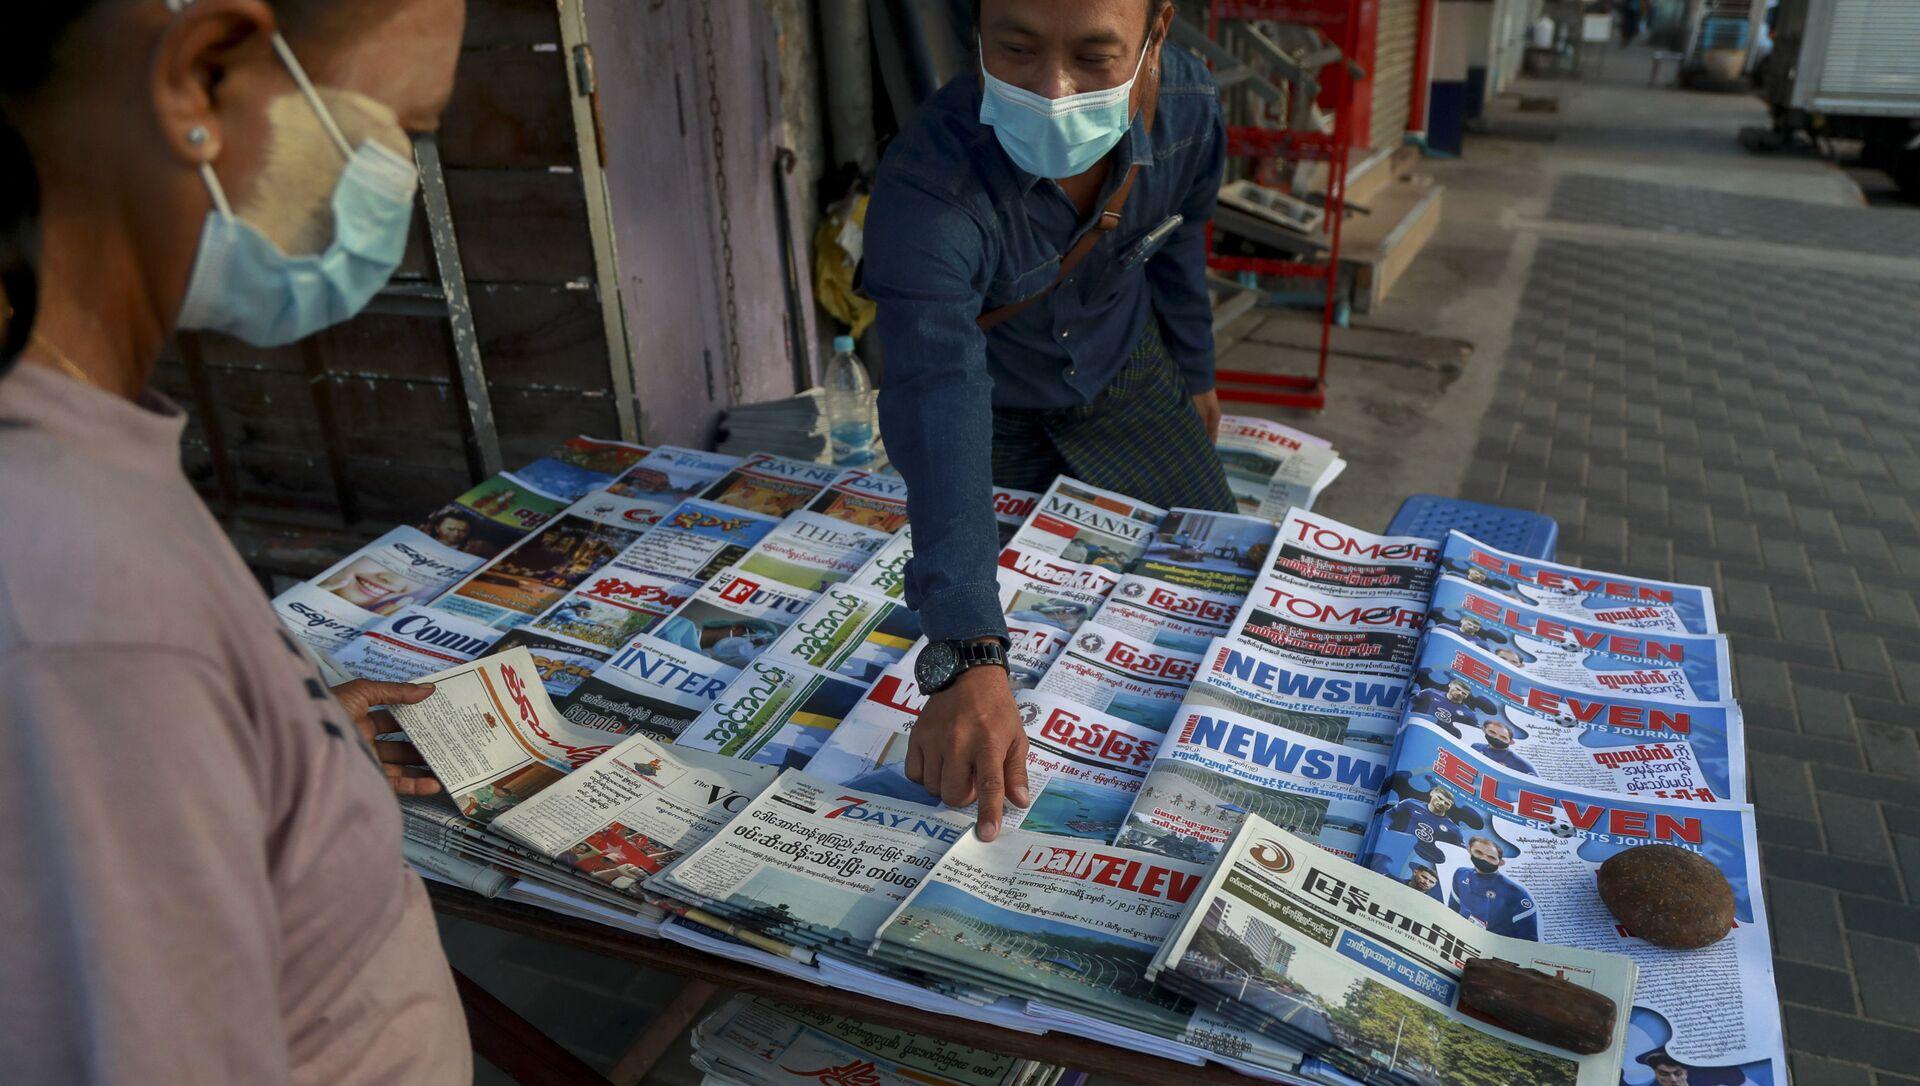 Venditore di giornali in Myanmar - Sputnik Italia, 1920, 02.02.2021